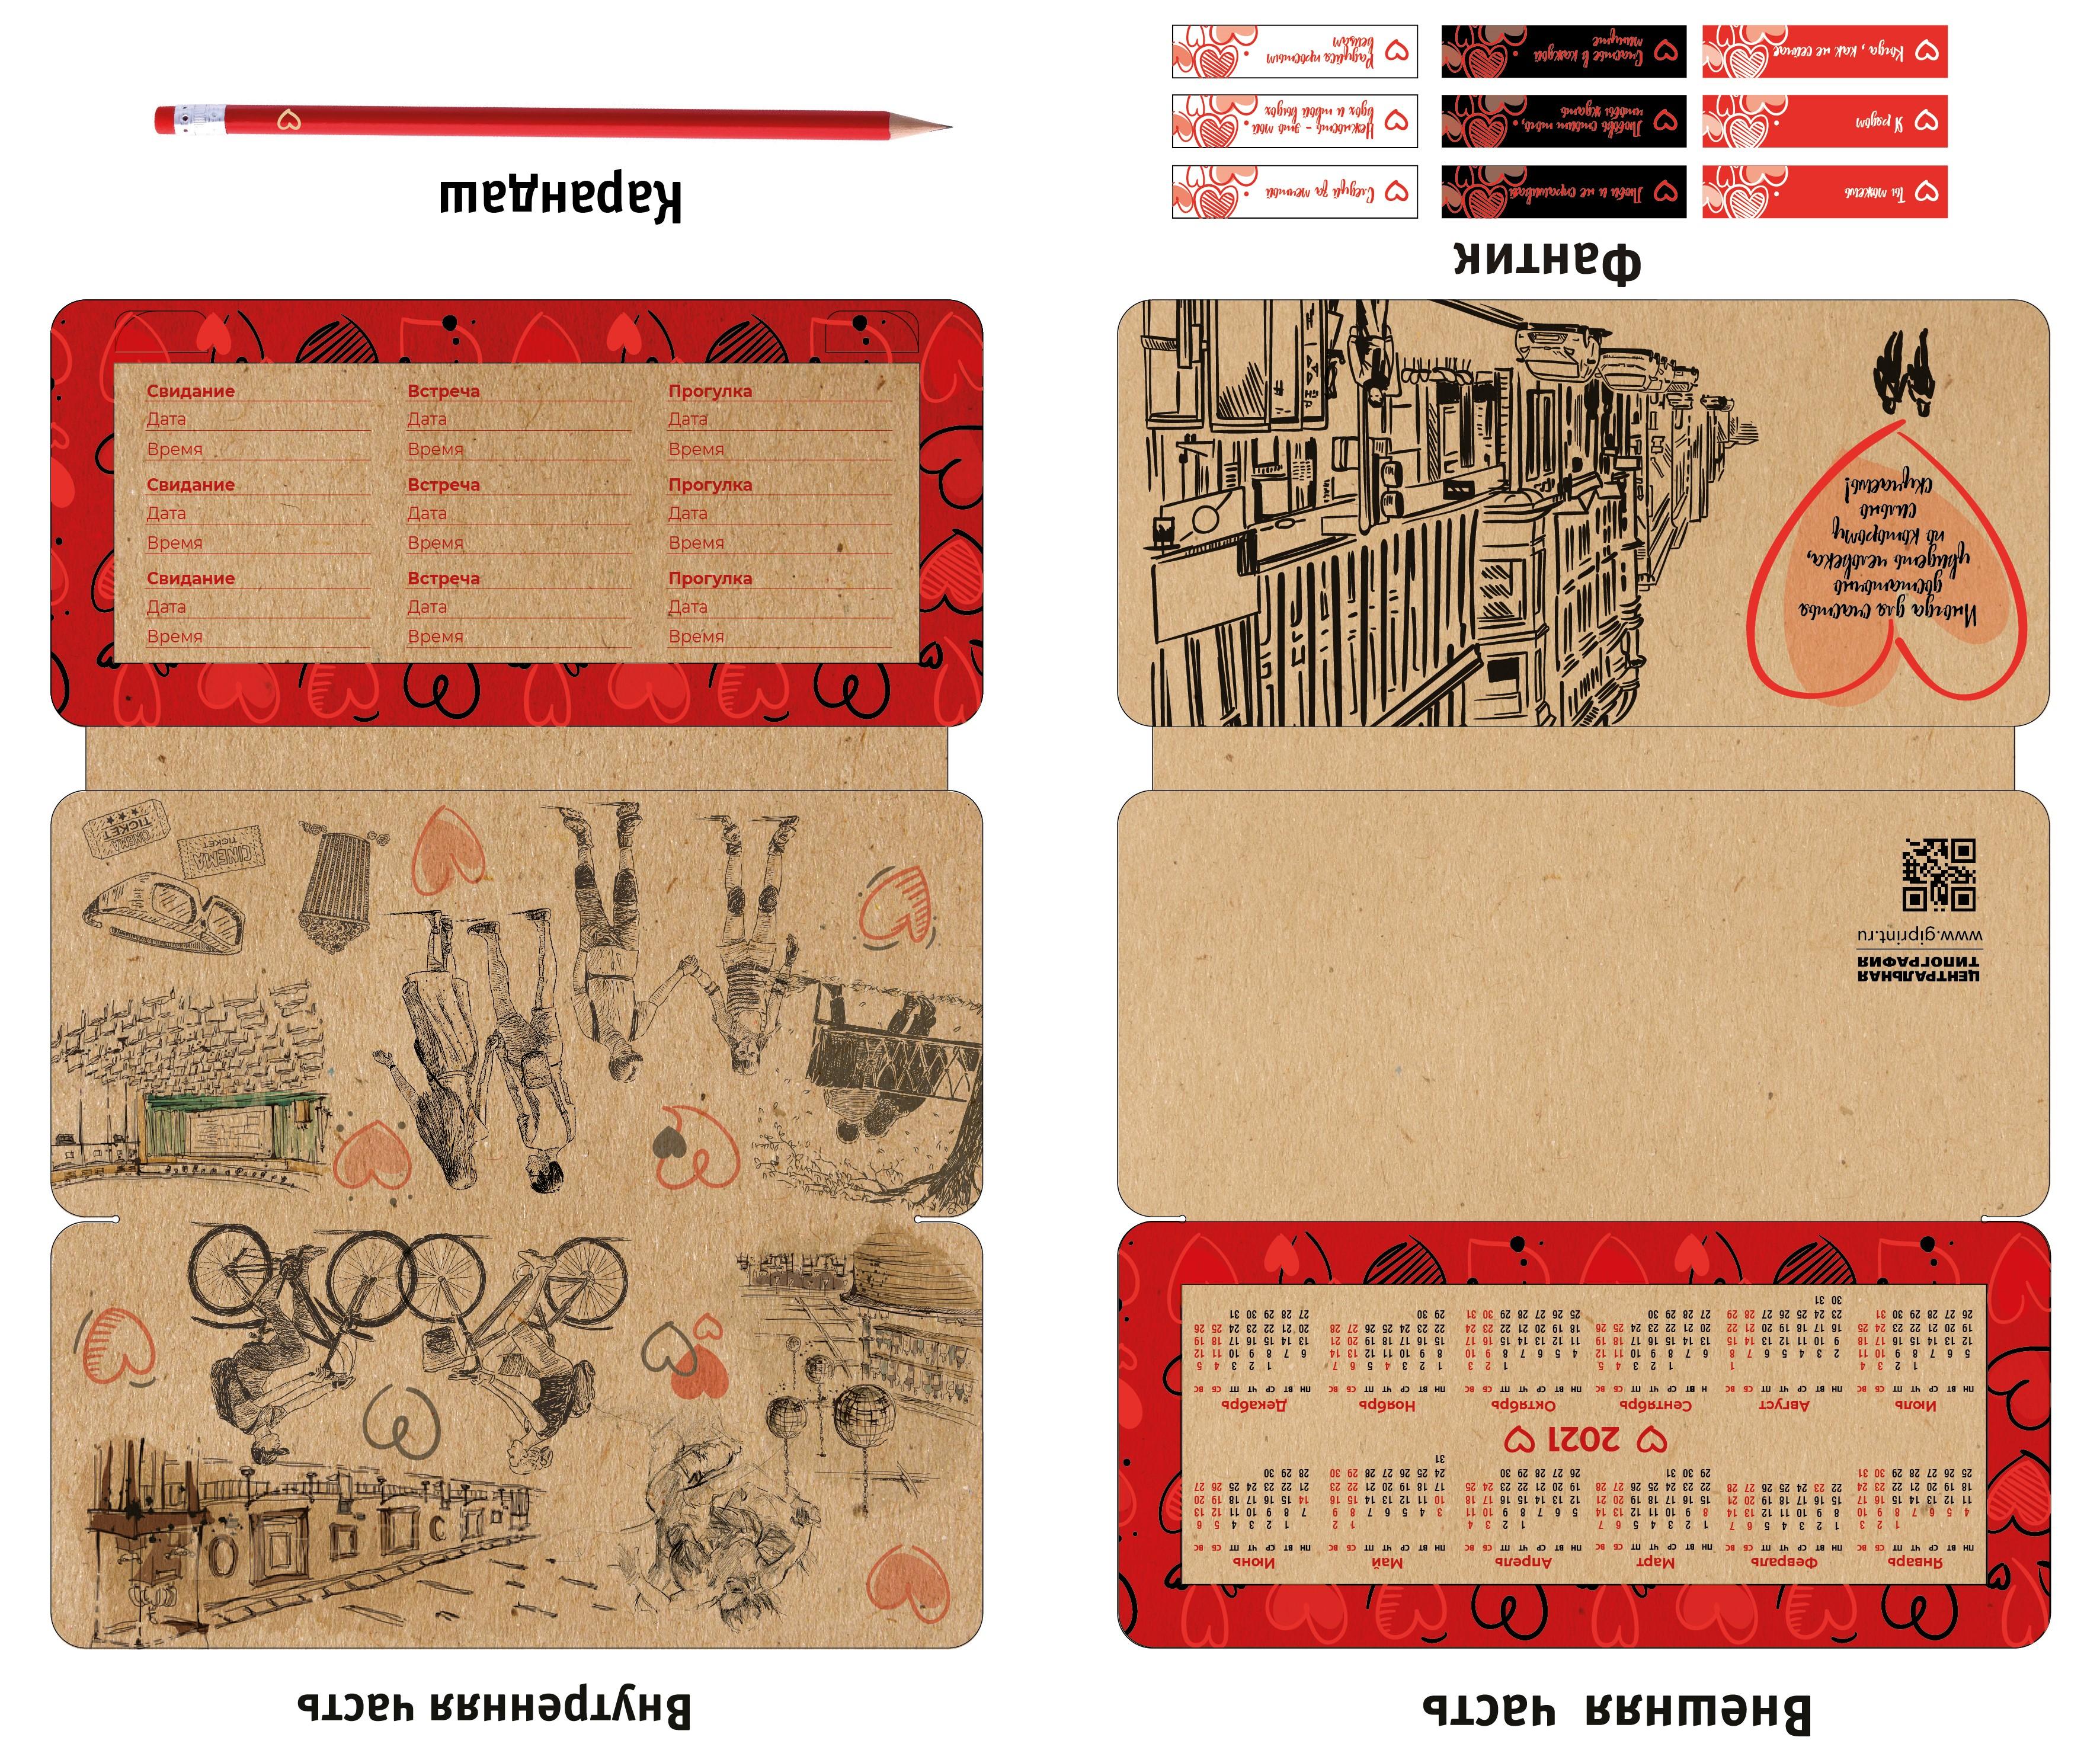 Стакан одноразовый бумажный, 200-250мл, SP9